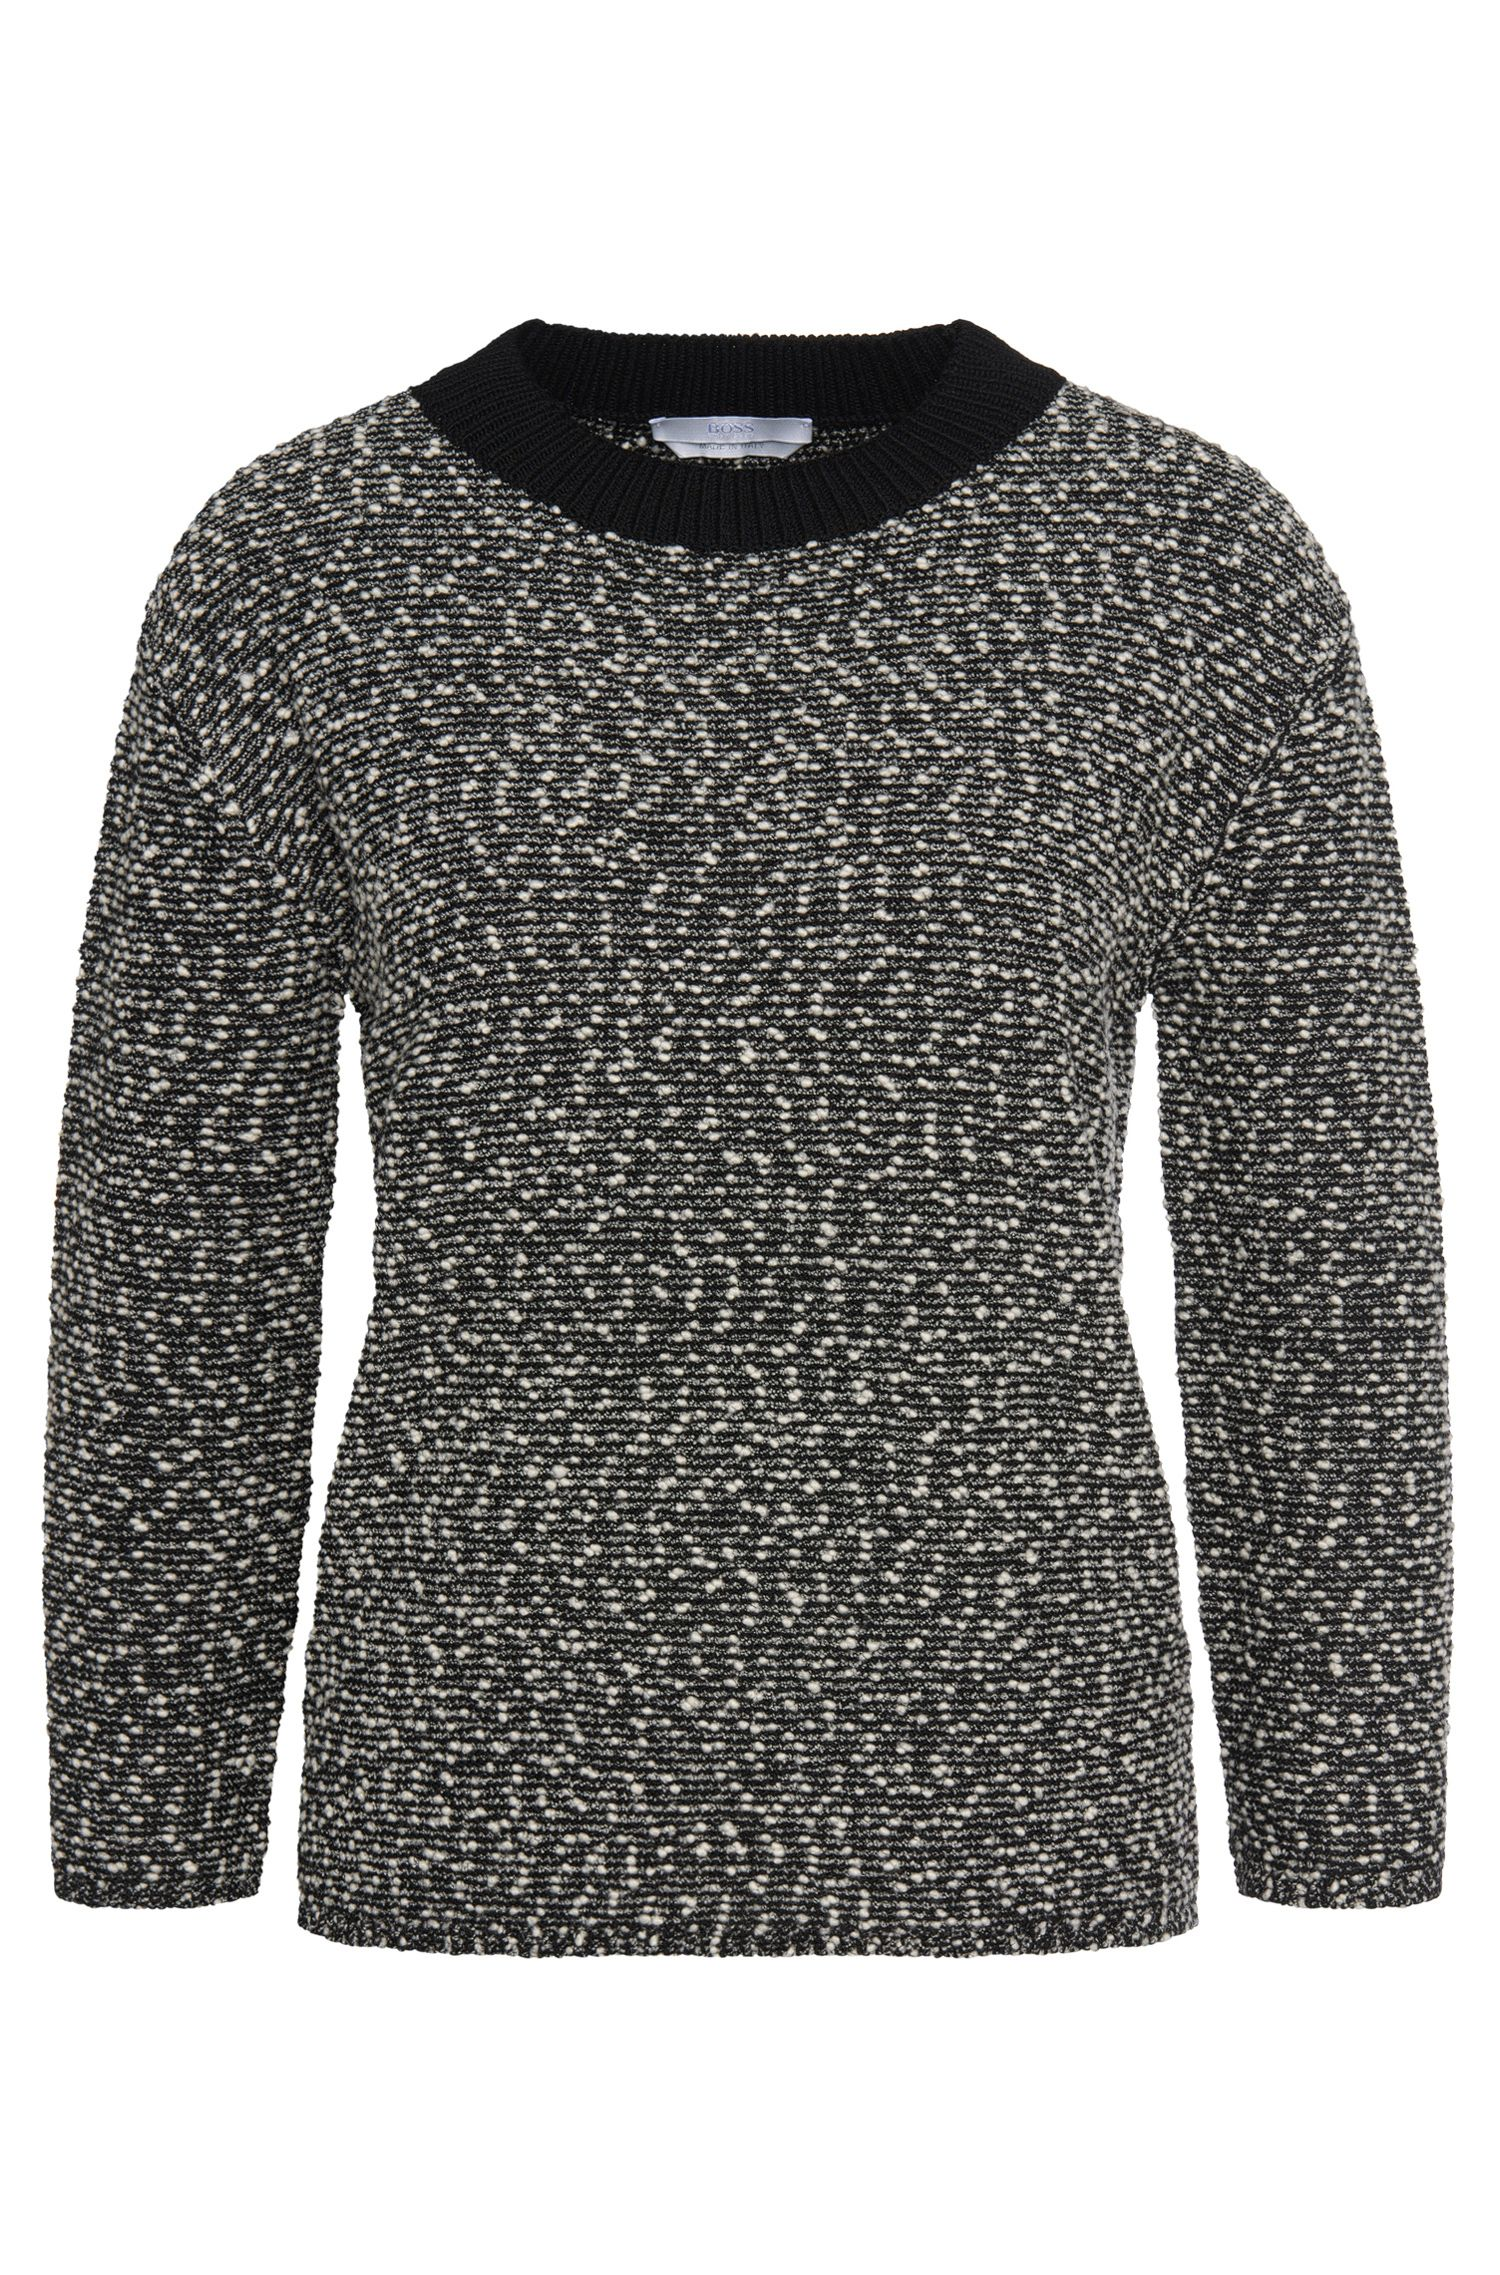 'Farala' | Stretch Italian Virgin Wool Blend Slub Sweater